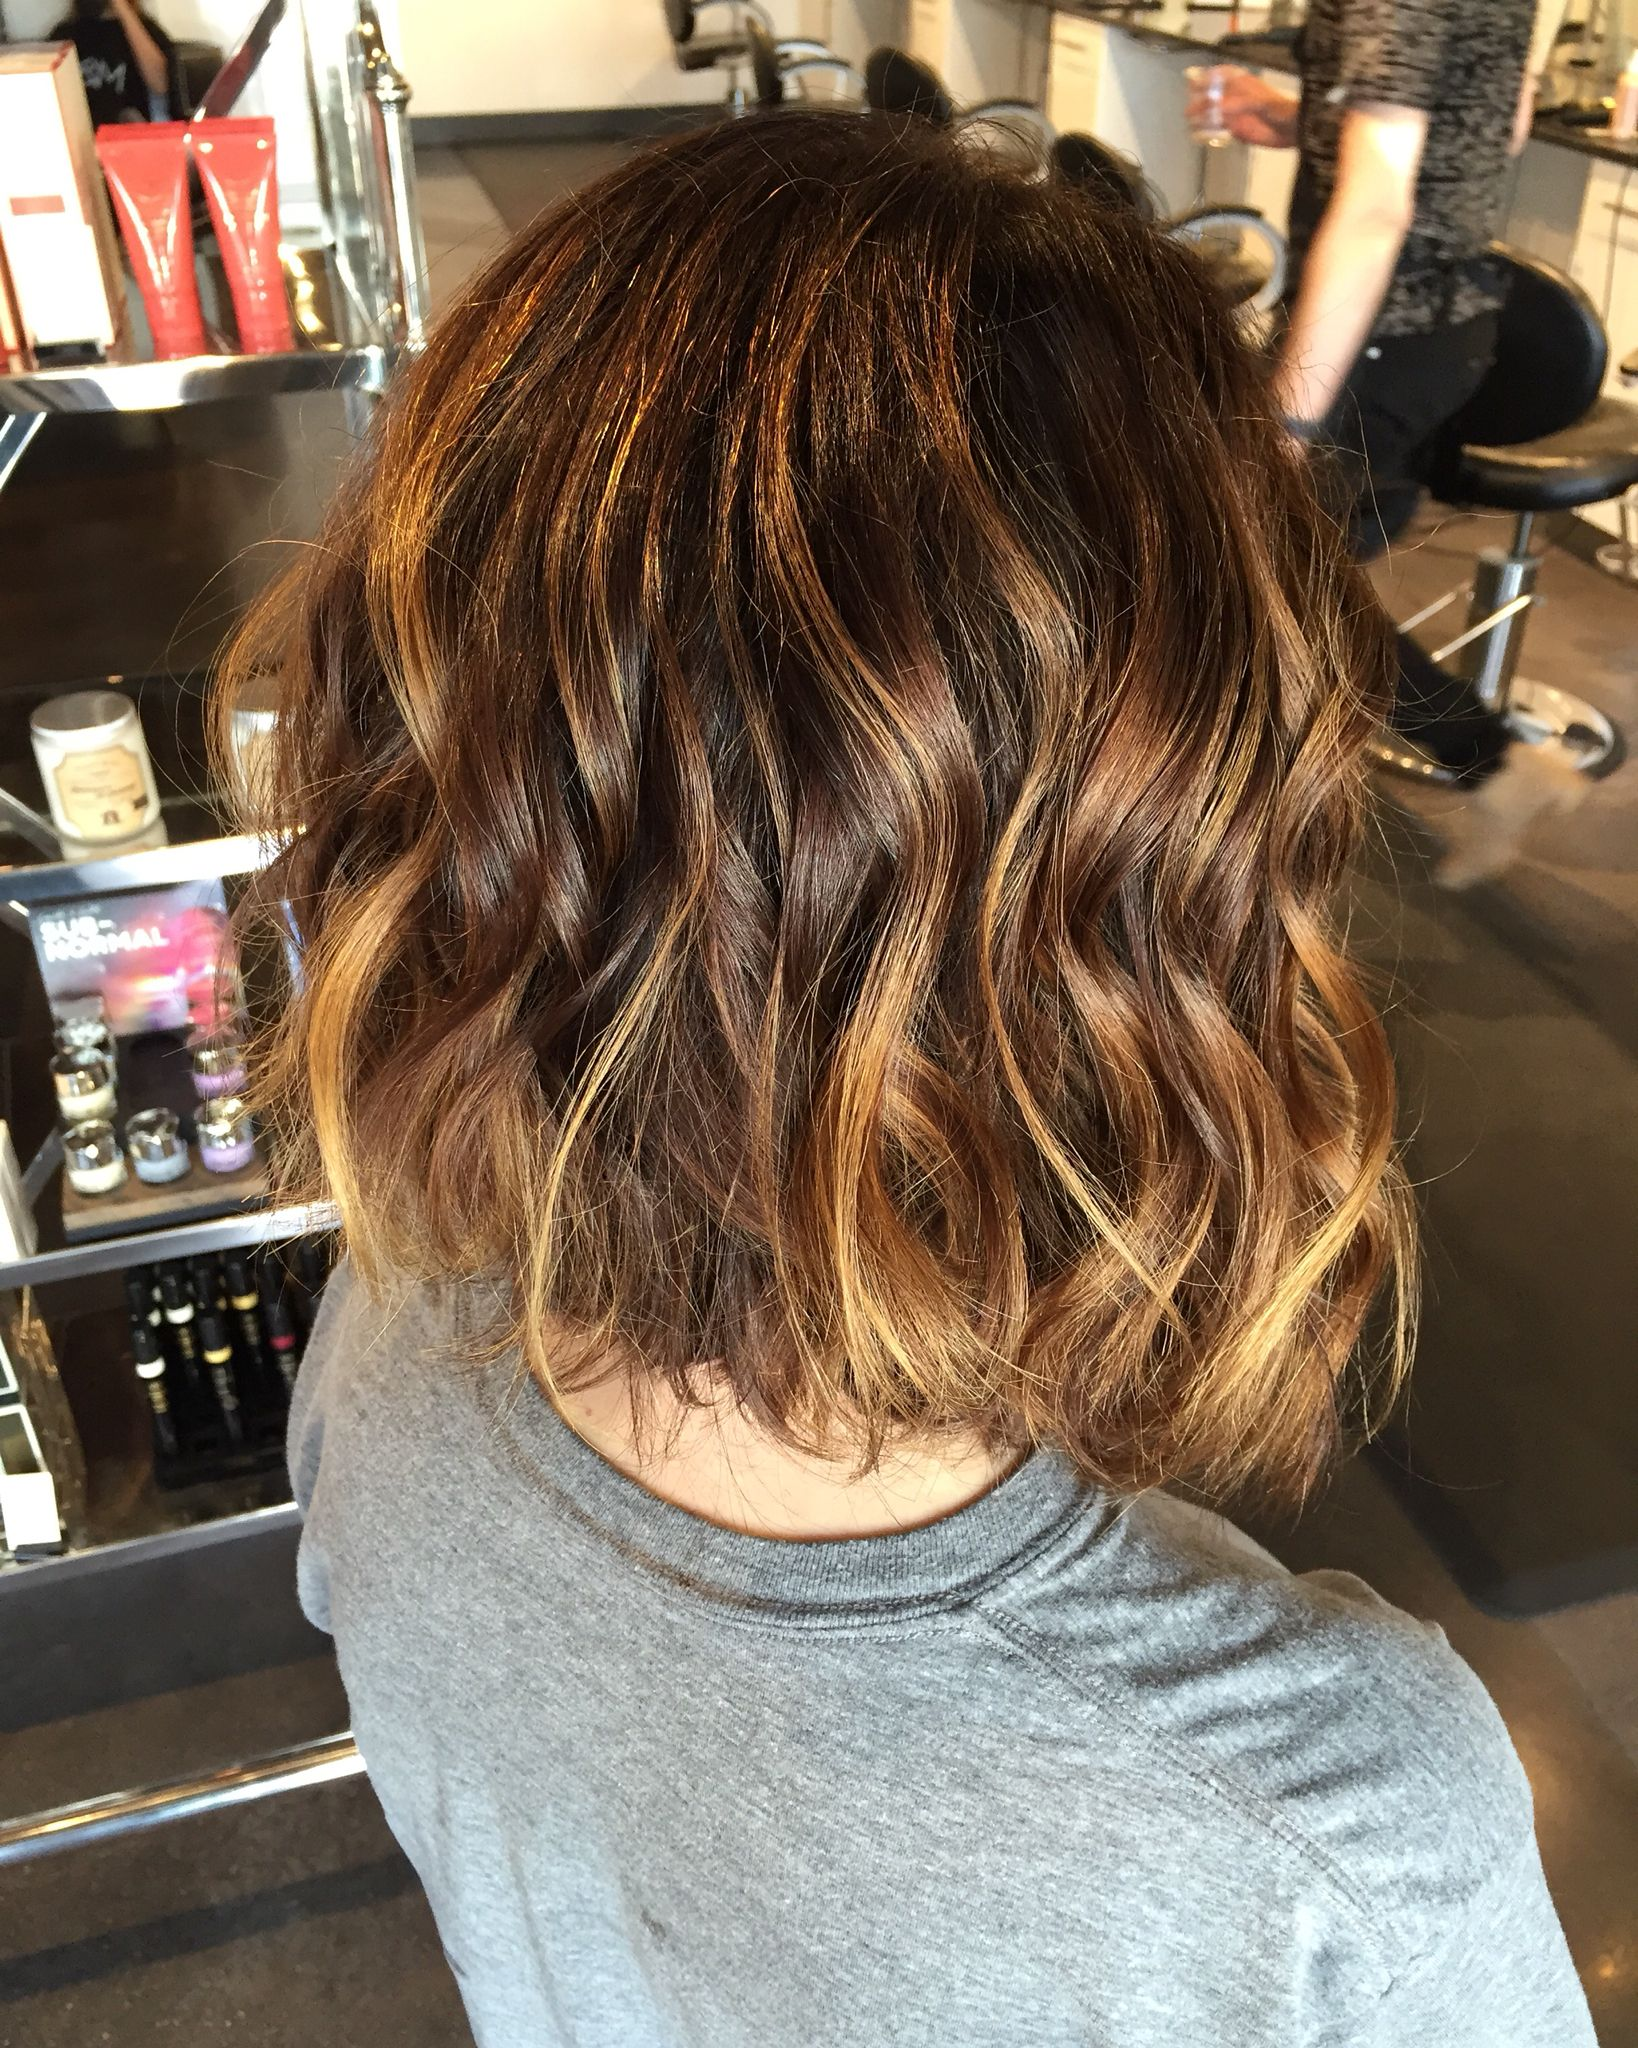 Caramel Balayage On Short Chocolate Brown Hair Beachy Sun Kissed Waves On Short Hair Short Hair Balayage Chocolate Brown Hair Balayage Hair Caramel